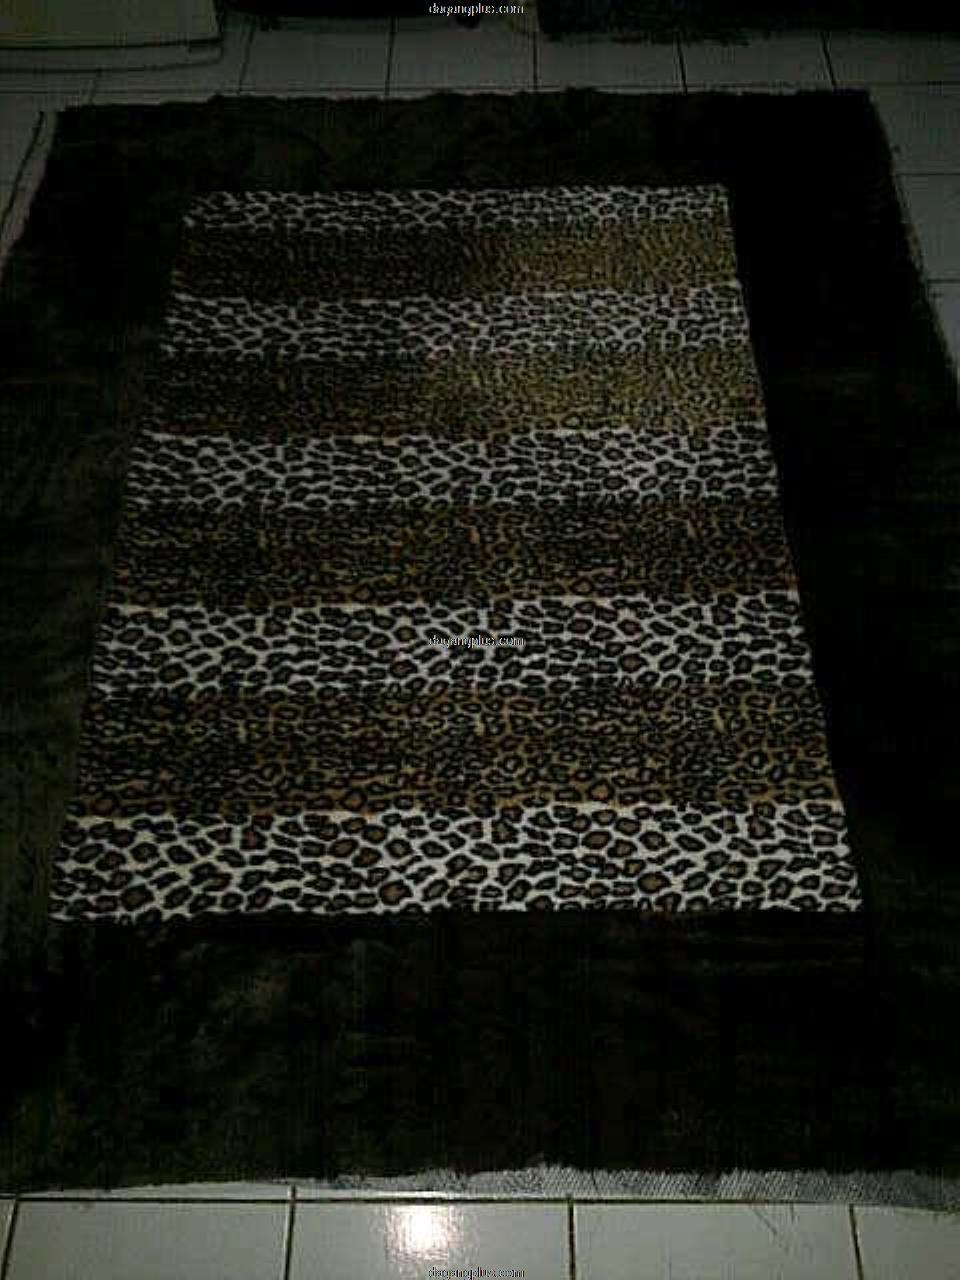 Karpet Bulu Halus Motif Kombinasi Leopard Coklat - Putih